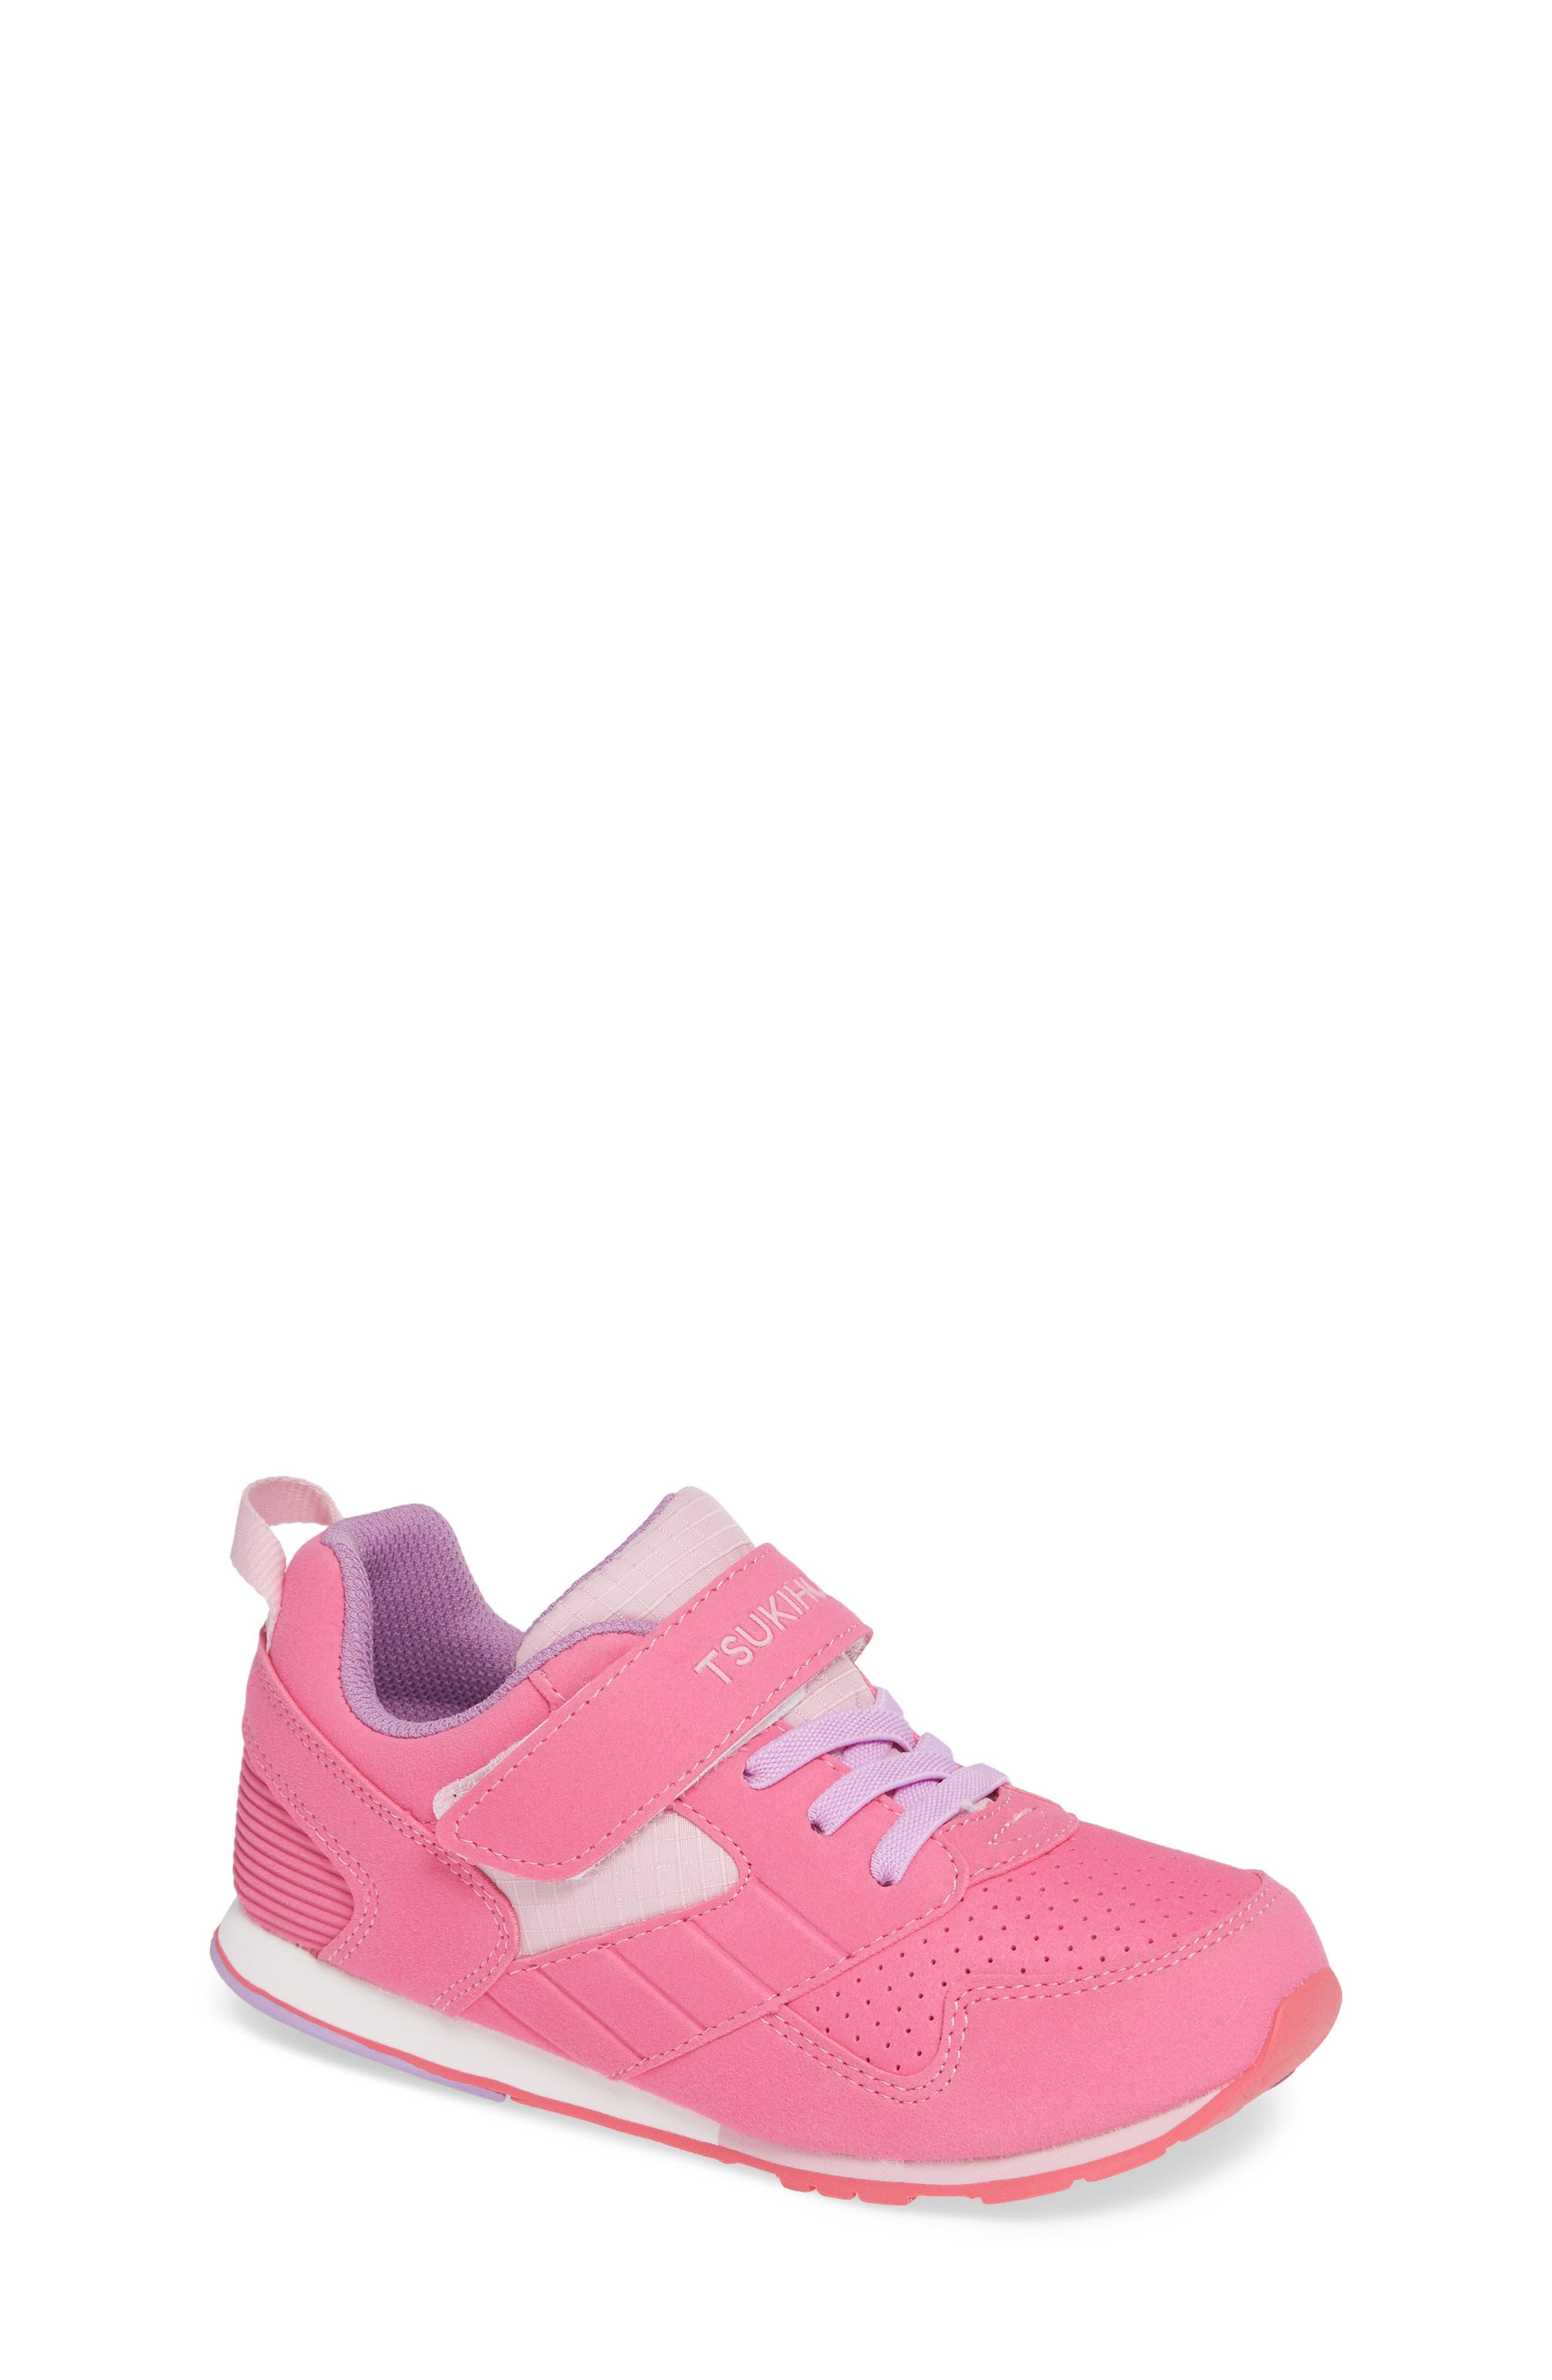 TSUKIHOSHI Racer Washable Sneaker, Main, color, FUCHSIA/ PINK